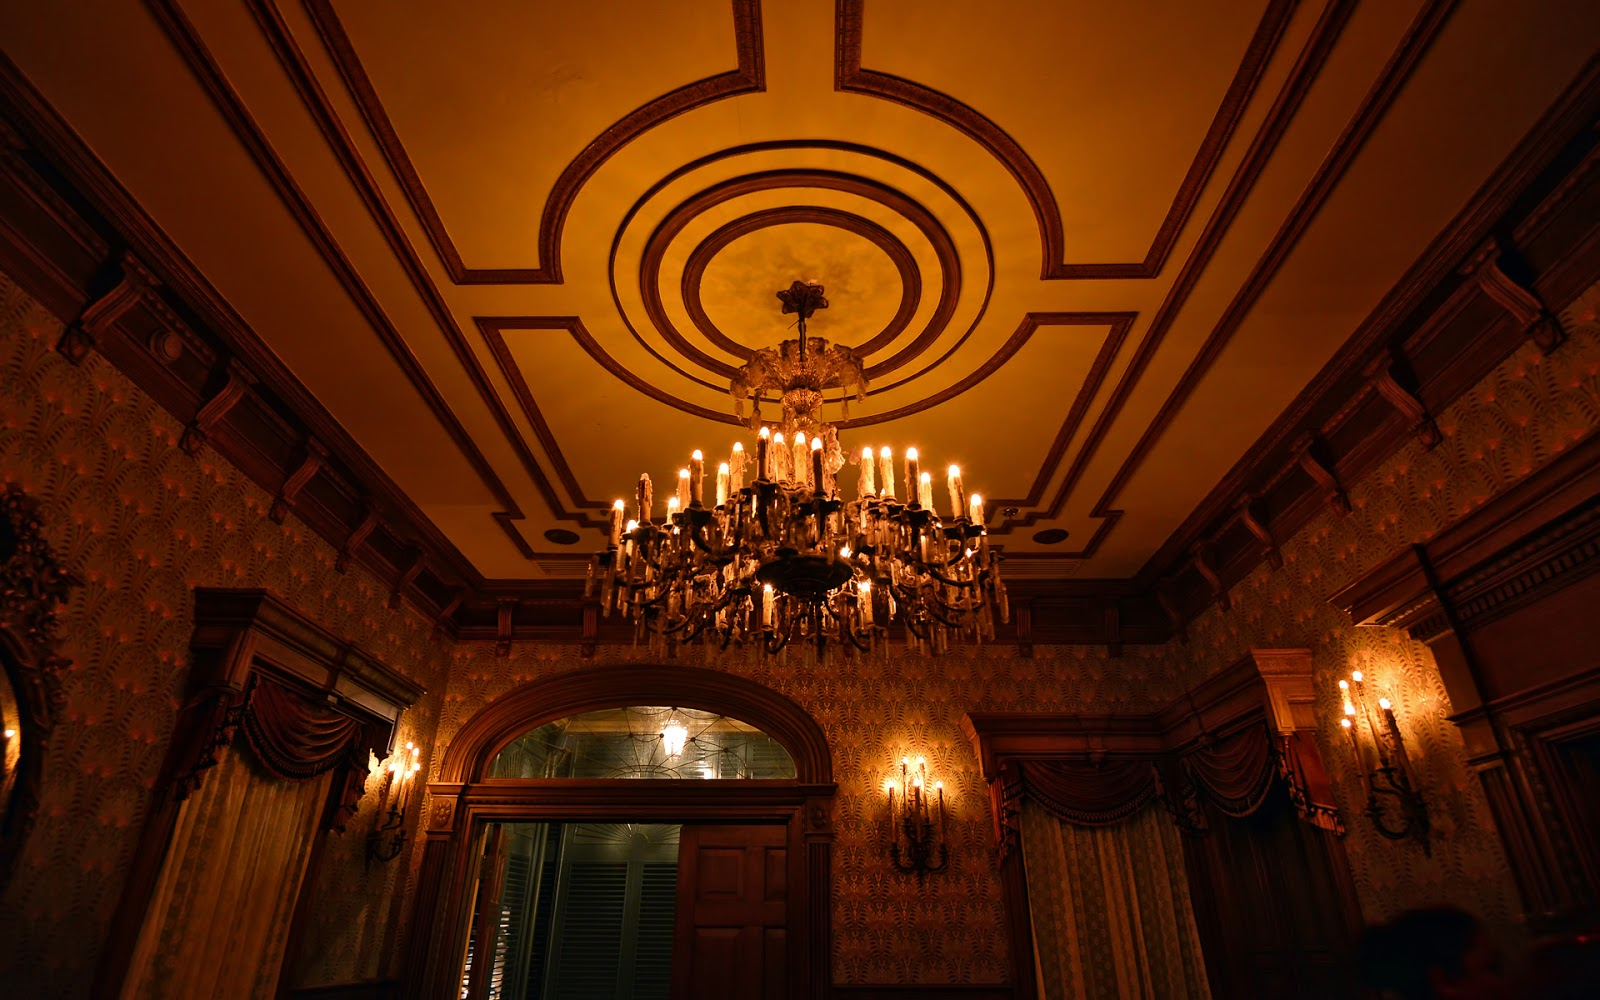 Haunted Mansion Foyer Wallpaper : Photo collection haunted mansion foyer by